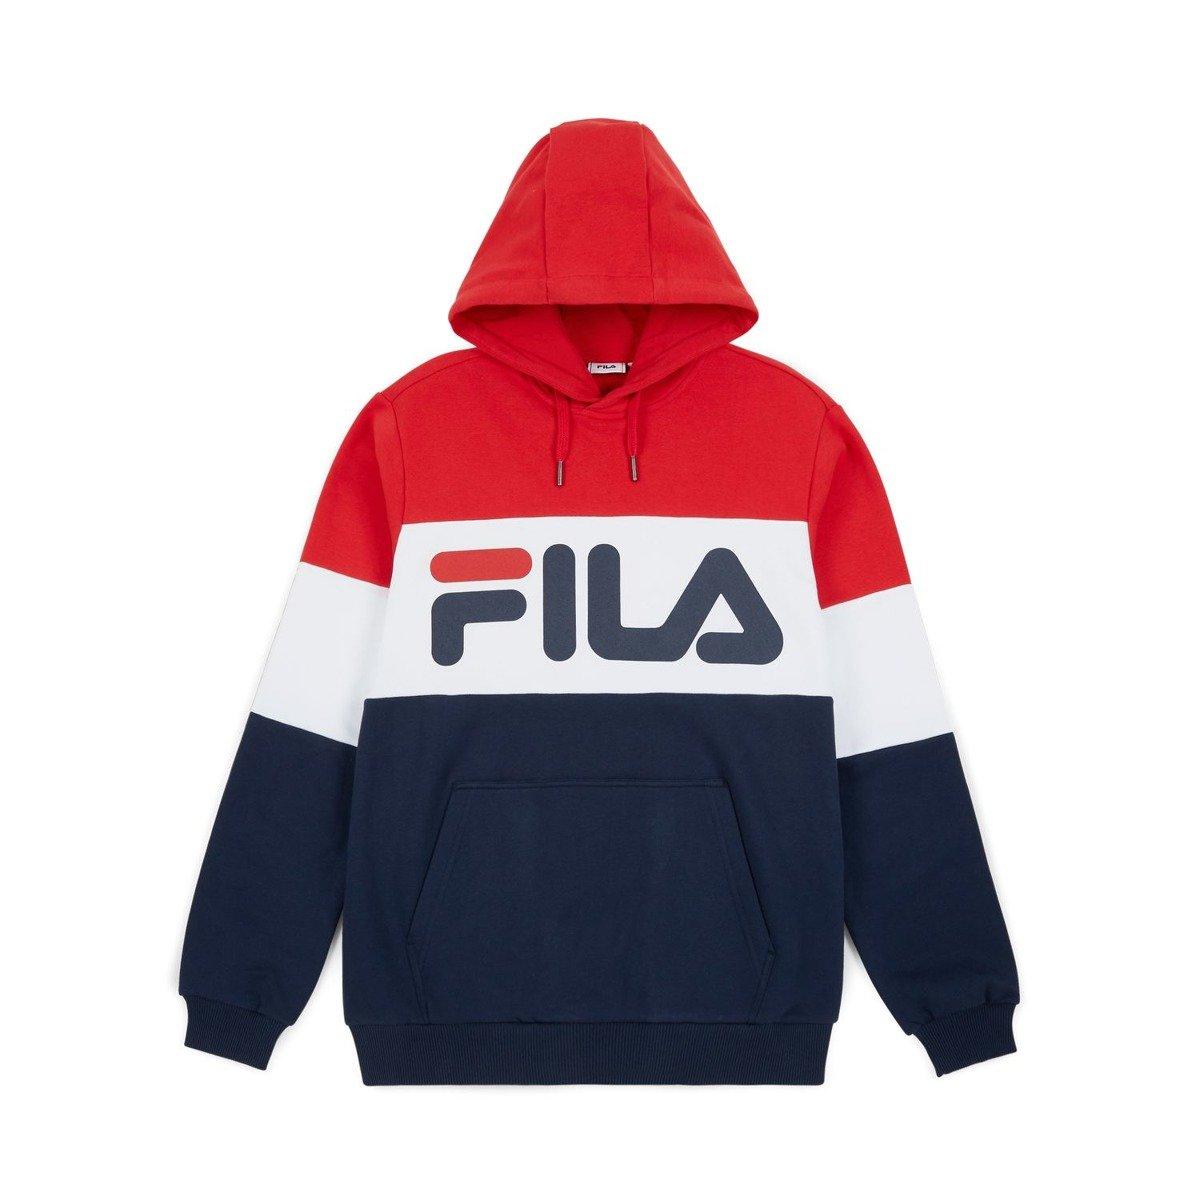 d6e068bfdcd1 fila night blocked hoodie   SALE \ Sale 50% -70% \ Sweatshirts/Hoods SALE \  Sale - 40% \ Sweatshirts/Hoods Clothes \ Bluzy \ Hoods Brands \ Fila    Skateshop ...